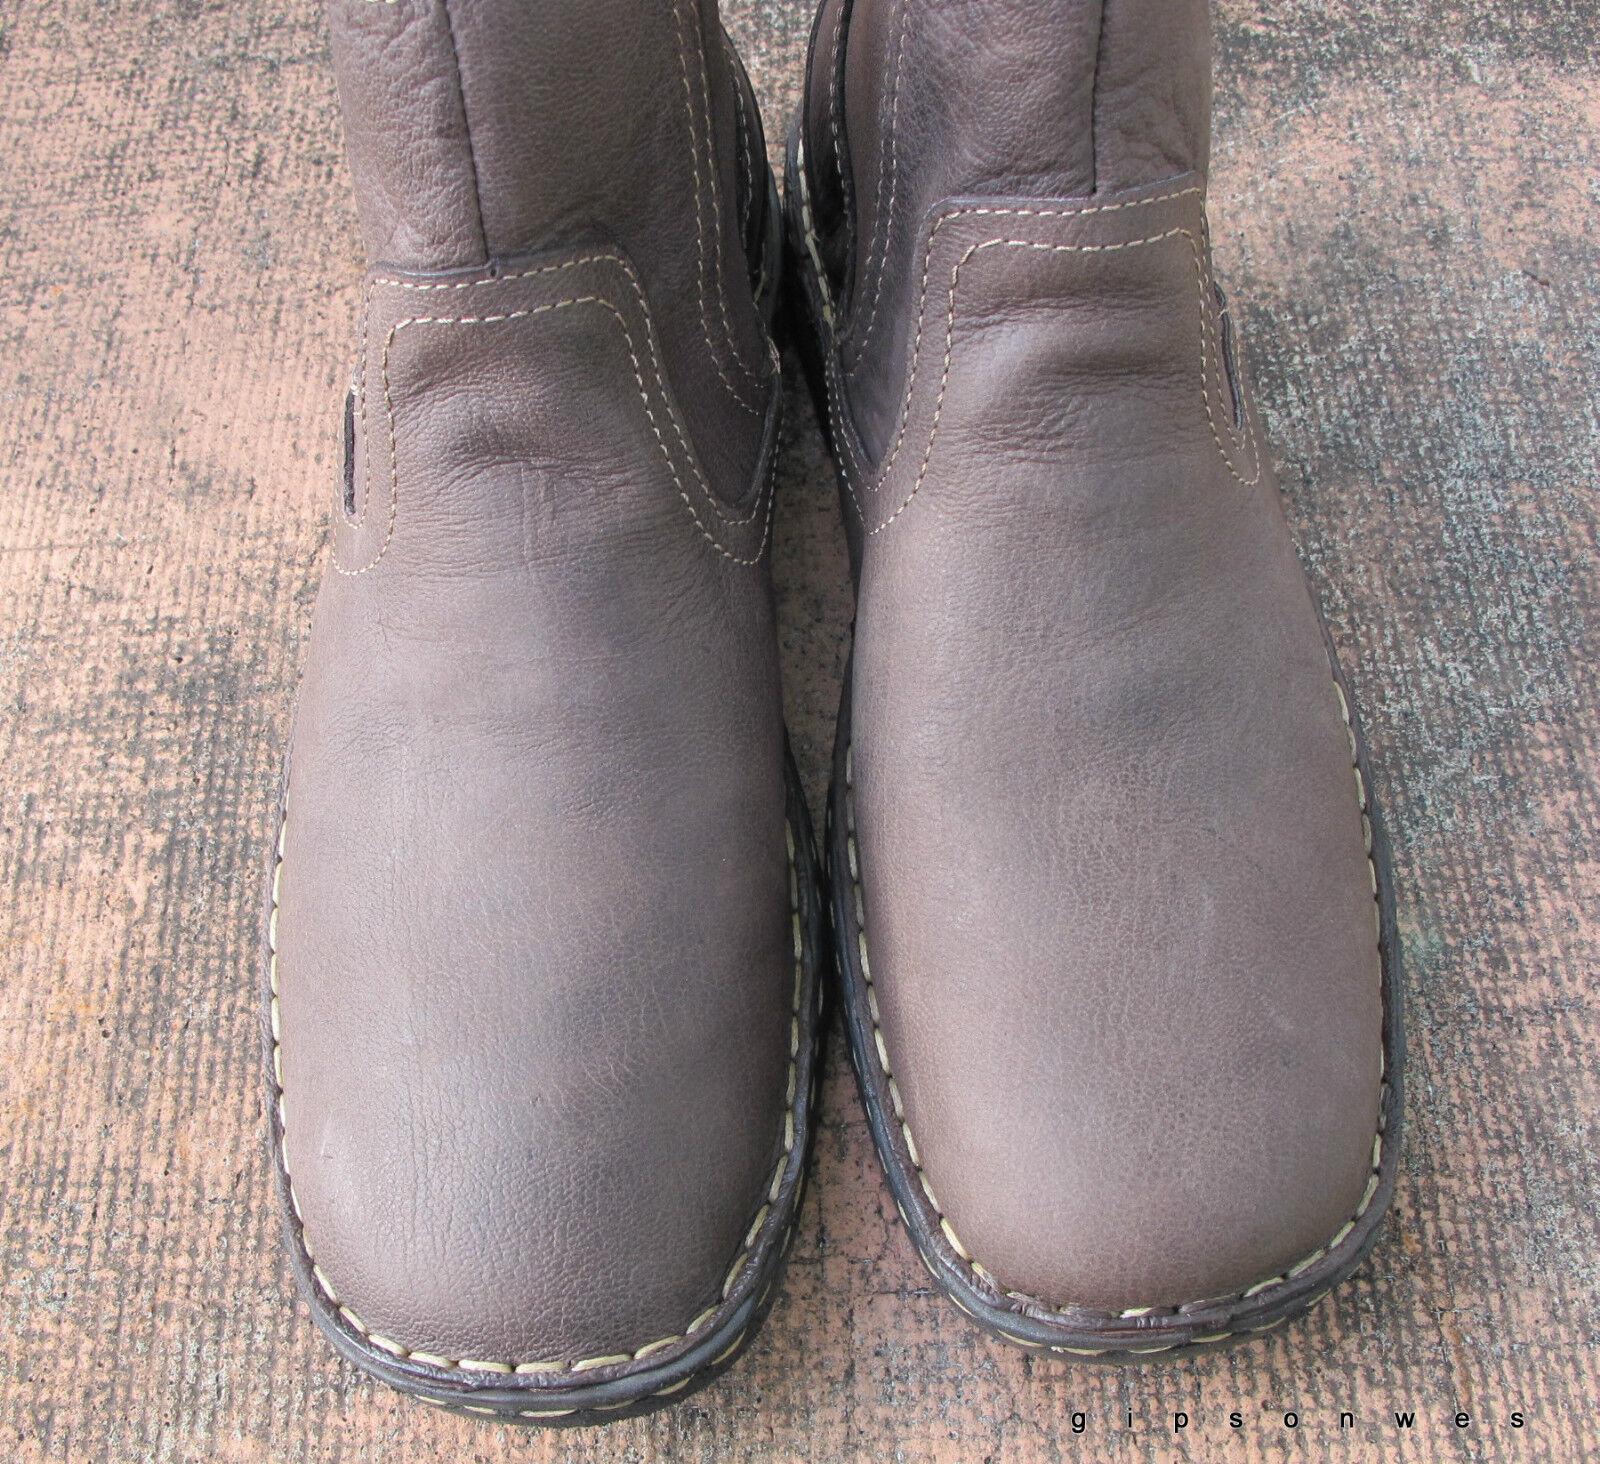 New Uomo Lassen Francia Francia Francia 8661 - Coffee Leather - Dimensione 11.5 44d483